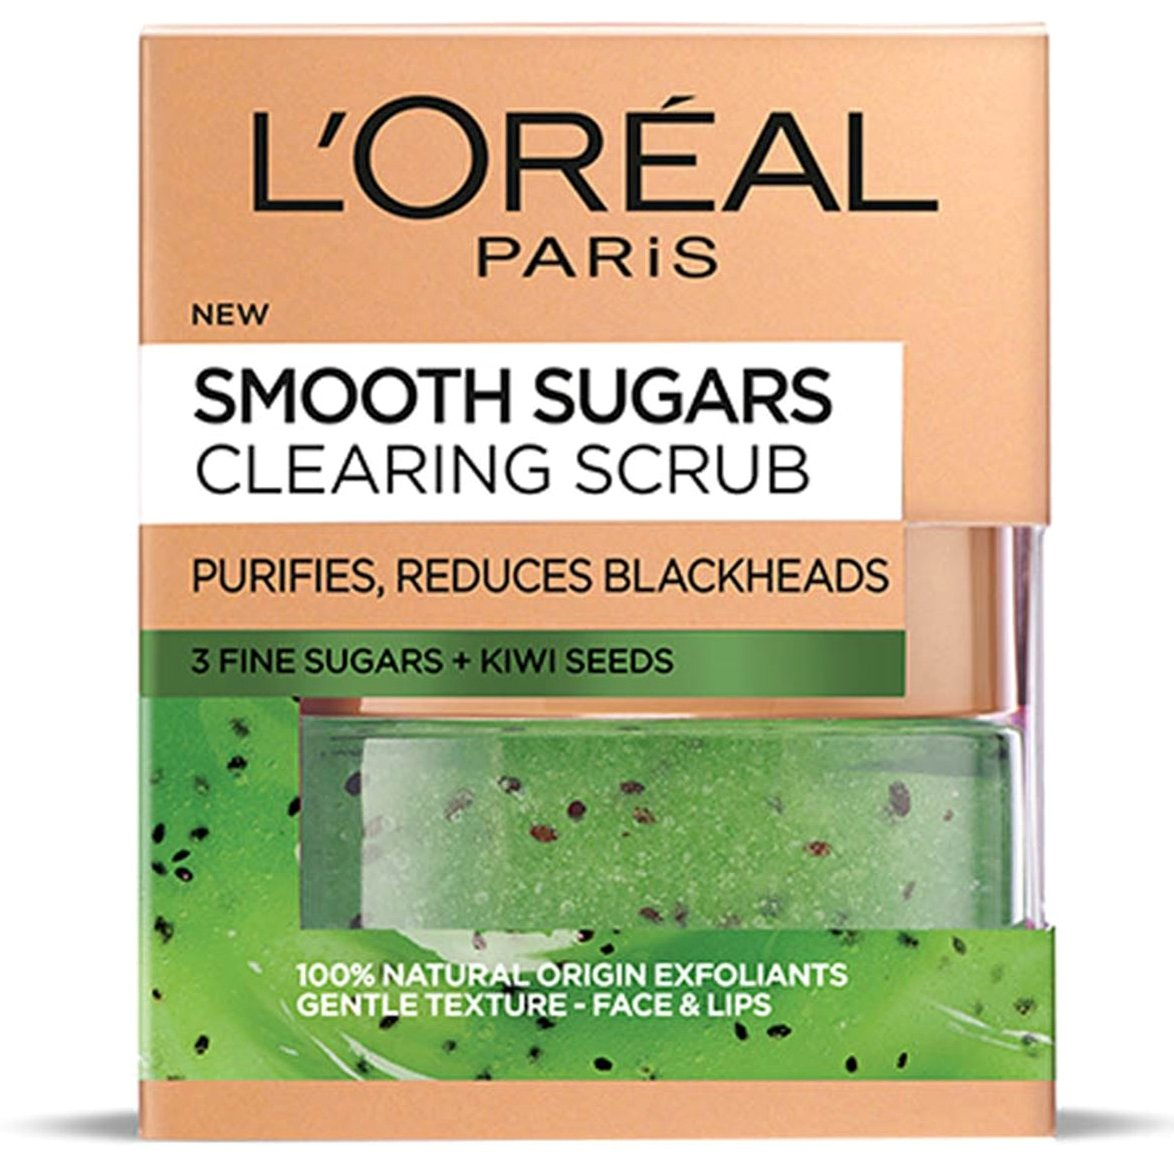 L'oreal Paris Smooth Sugars Clearing Scrub για Φρέσκια, Λαμπερή & Απαλή Επιδερμίδα 50ml